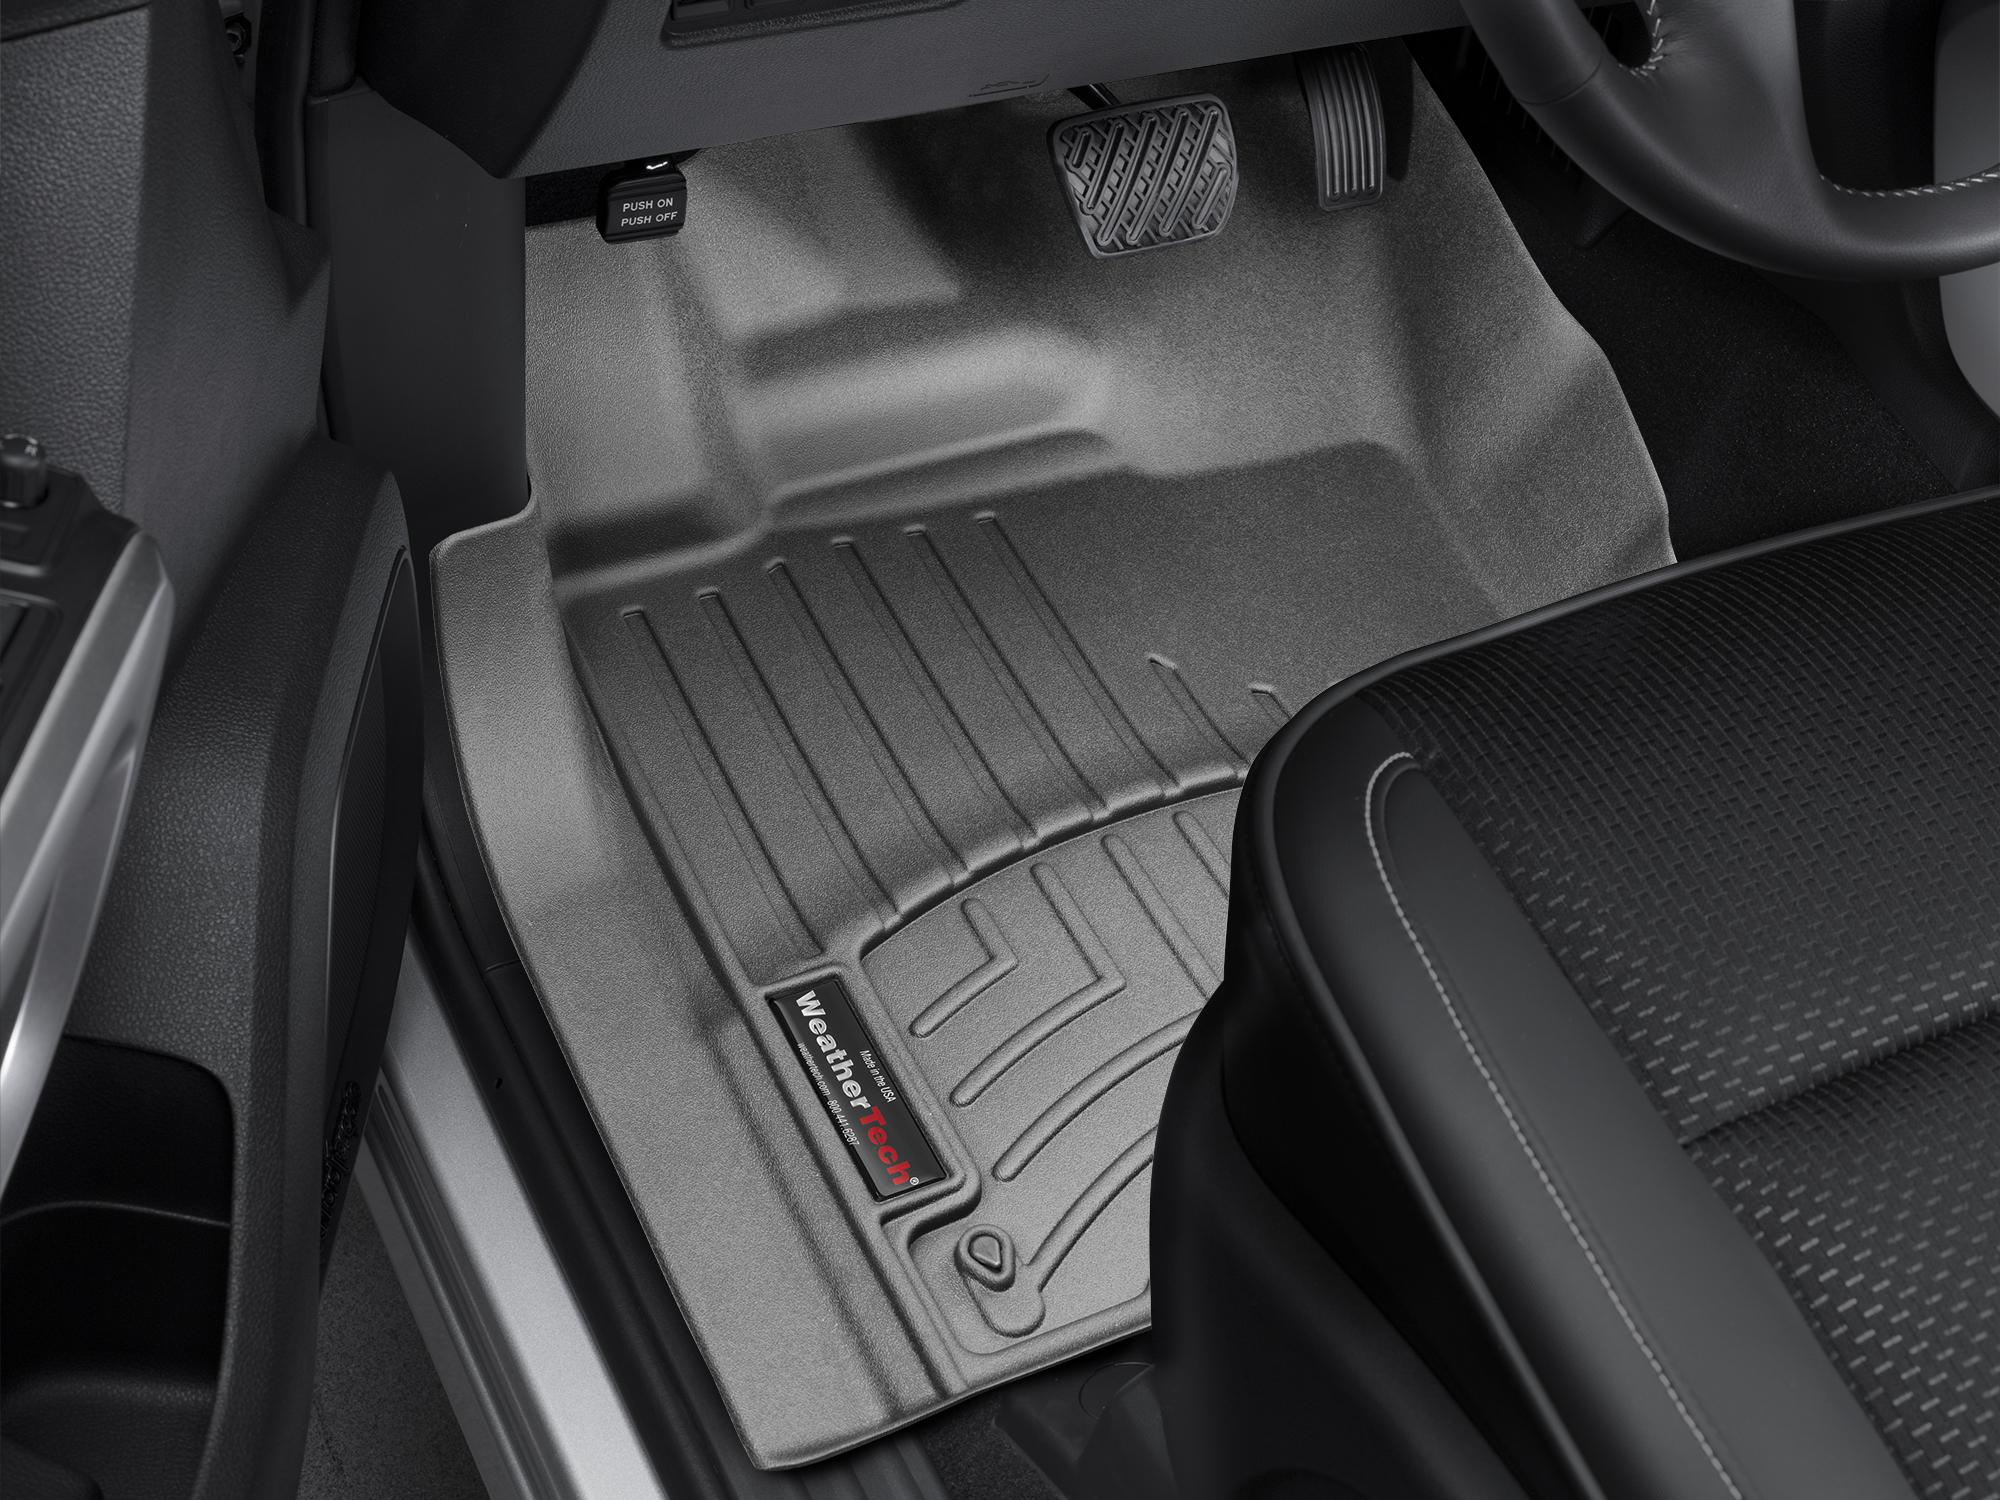 Nissan titan weathertech floor mats